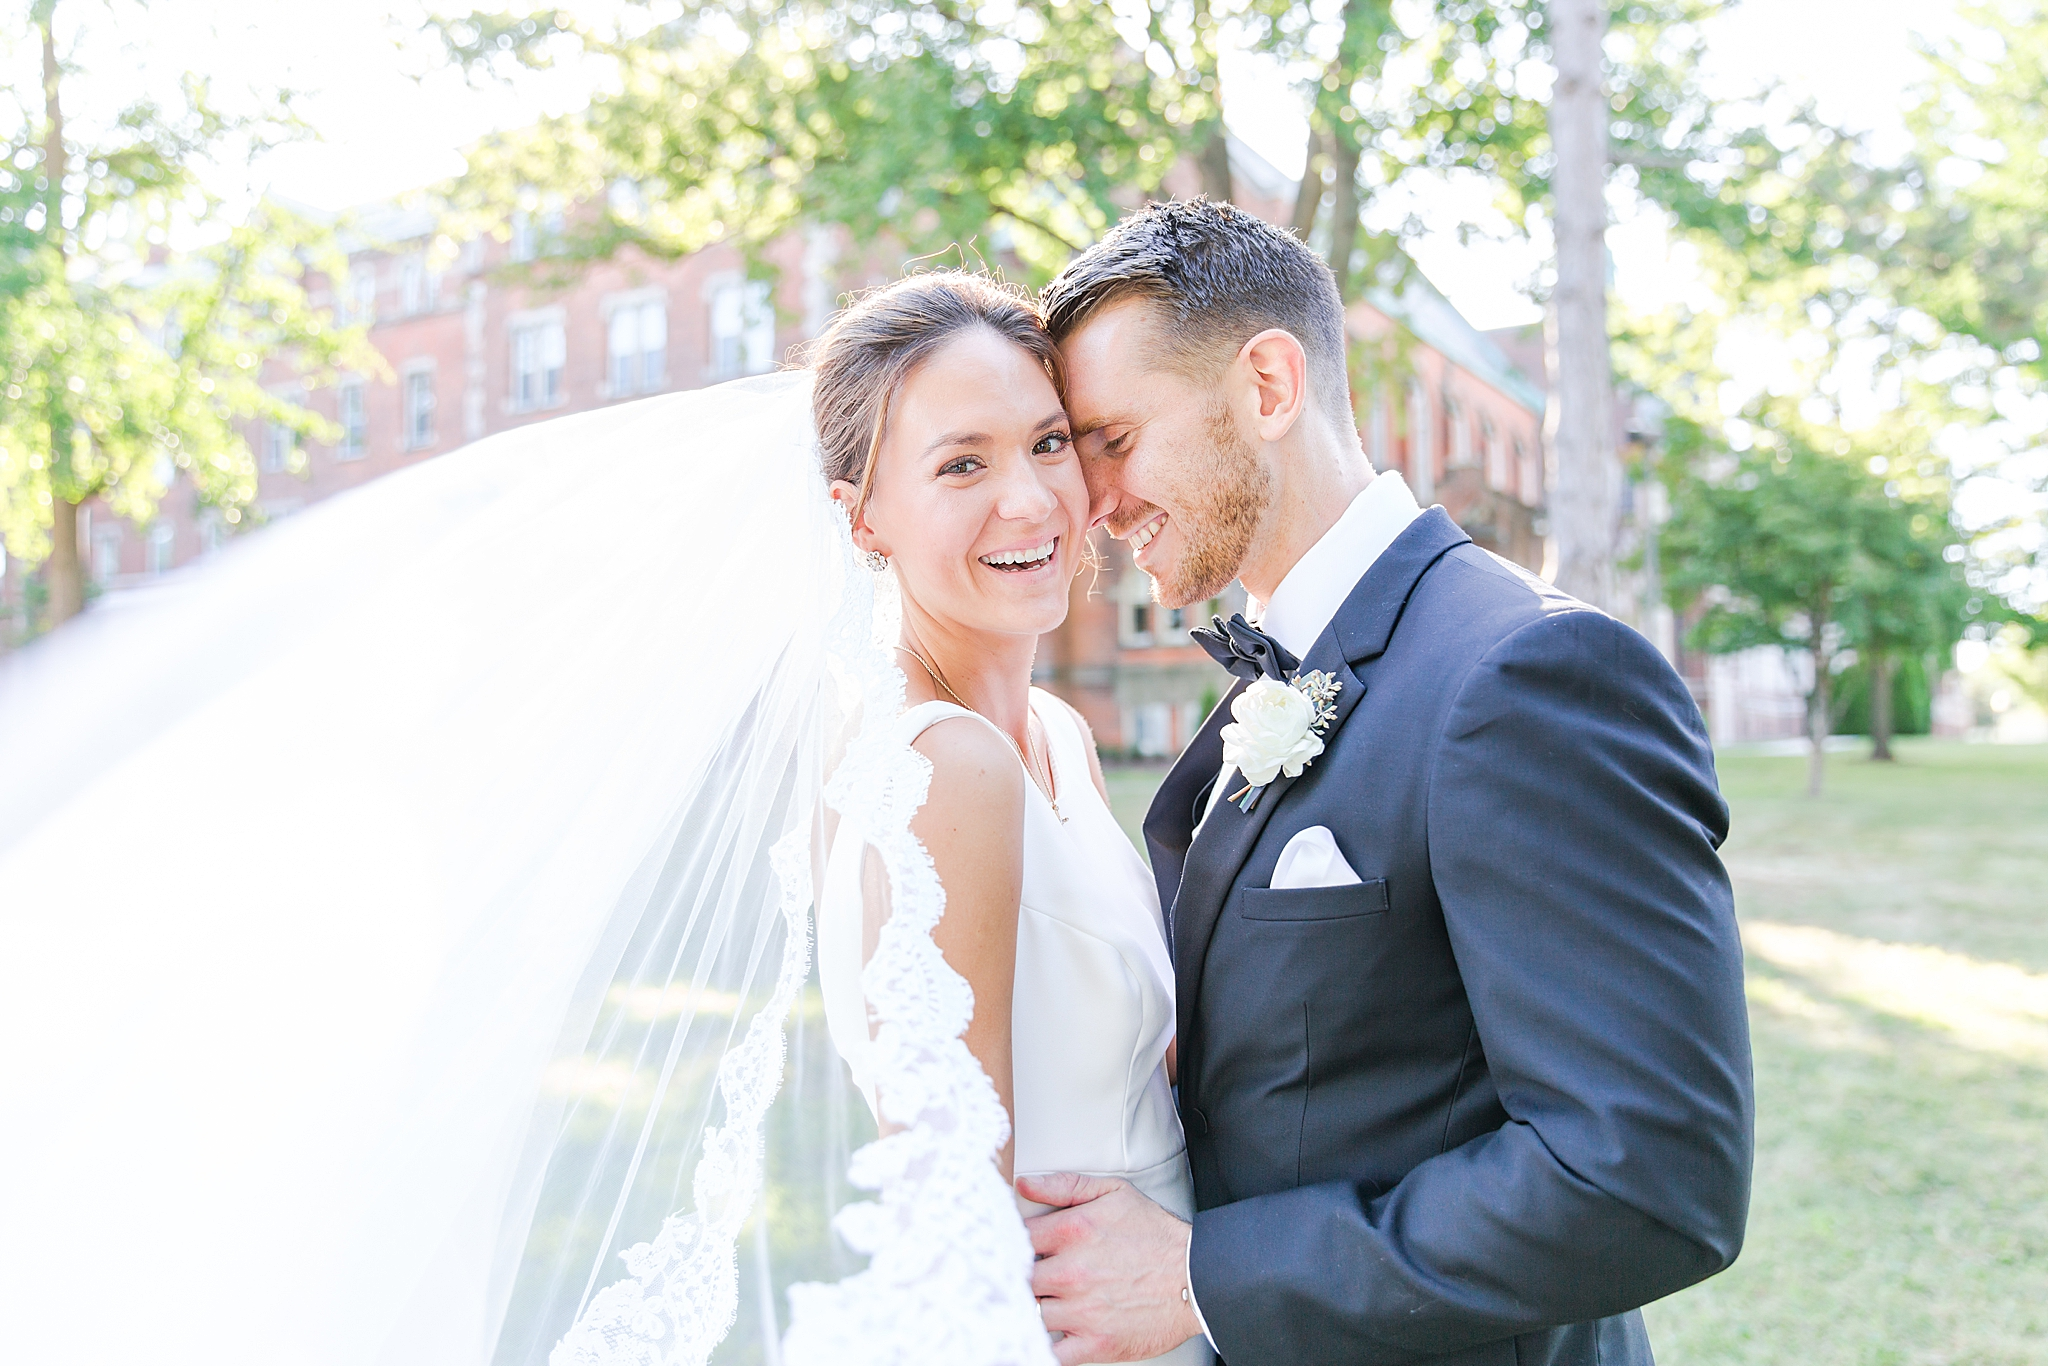 detroit-wedding-photographer-grosse-pointe-academy-chapel-detroit-golf-club-wedding-carly-matt-by-courtney-carolyn-photography_0064.jpg